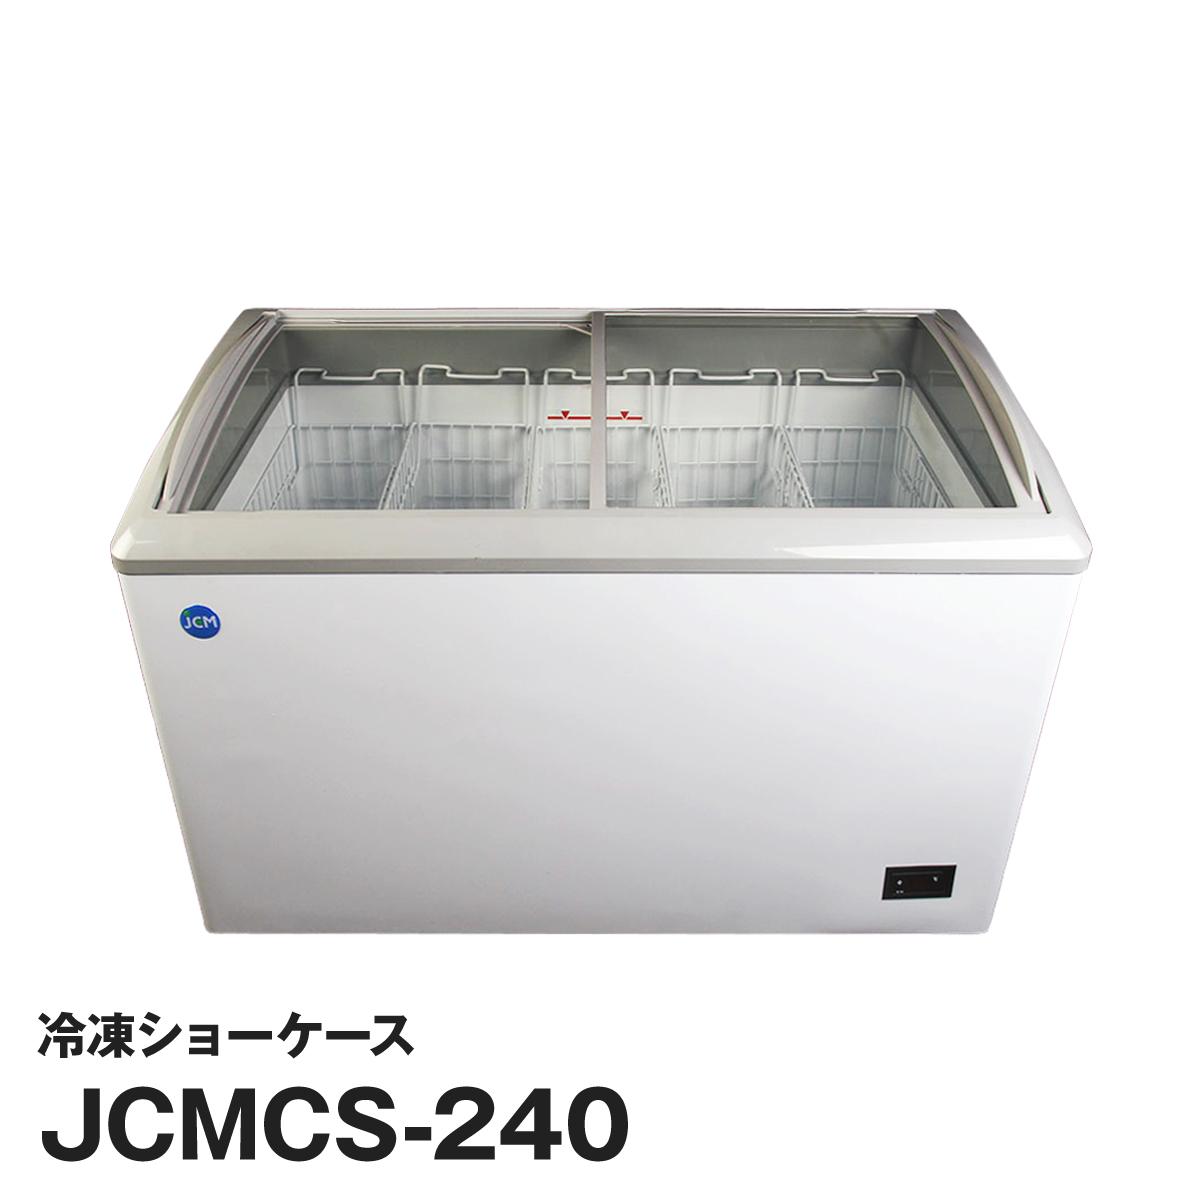 JCM社製 業務用 保冷庫 冷凍庫 240L スライド 冷凍ショーケース JCMCS-240 新品